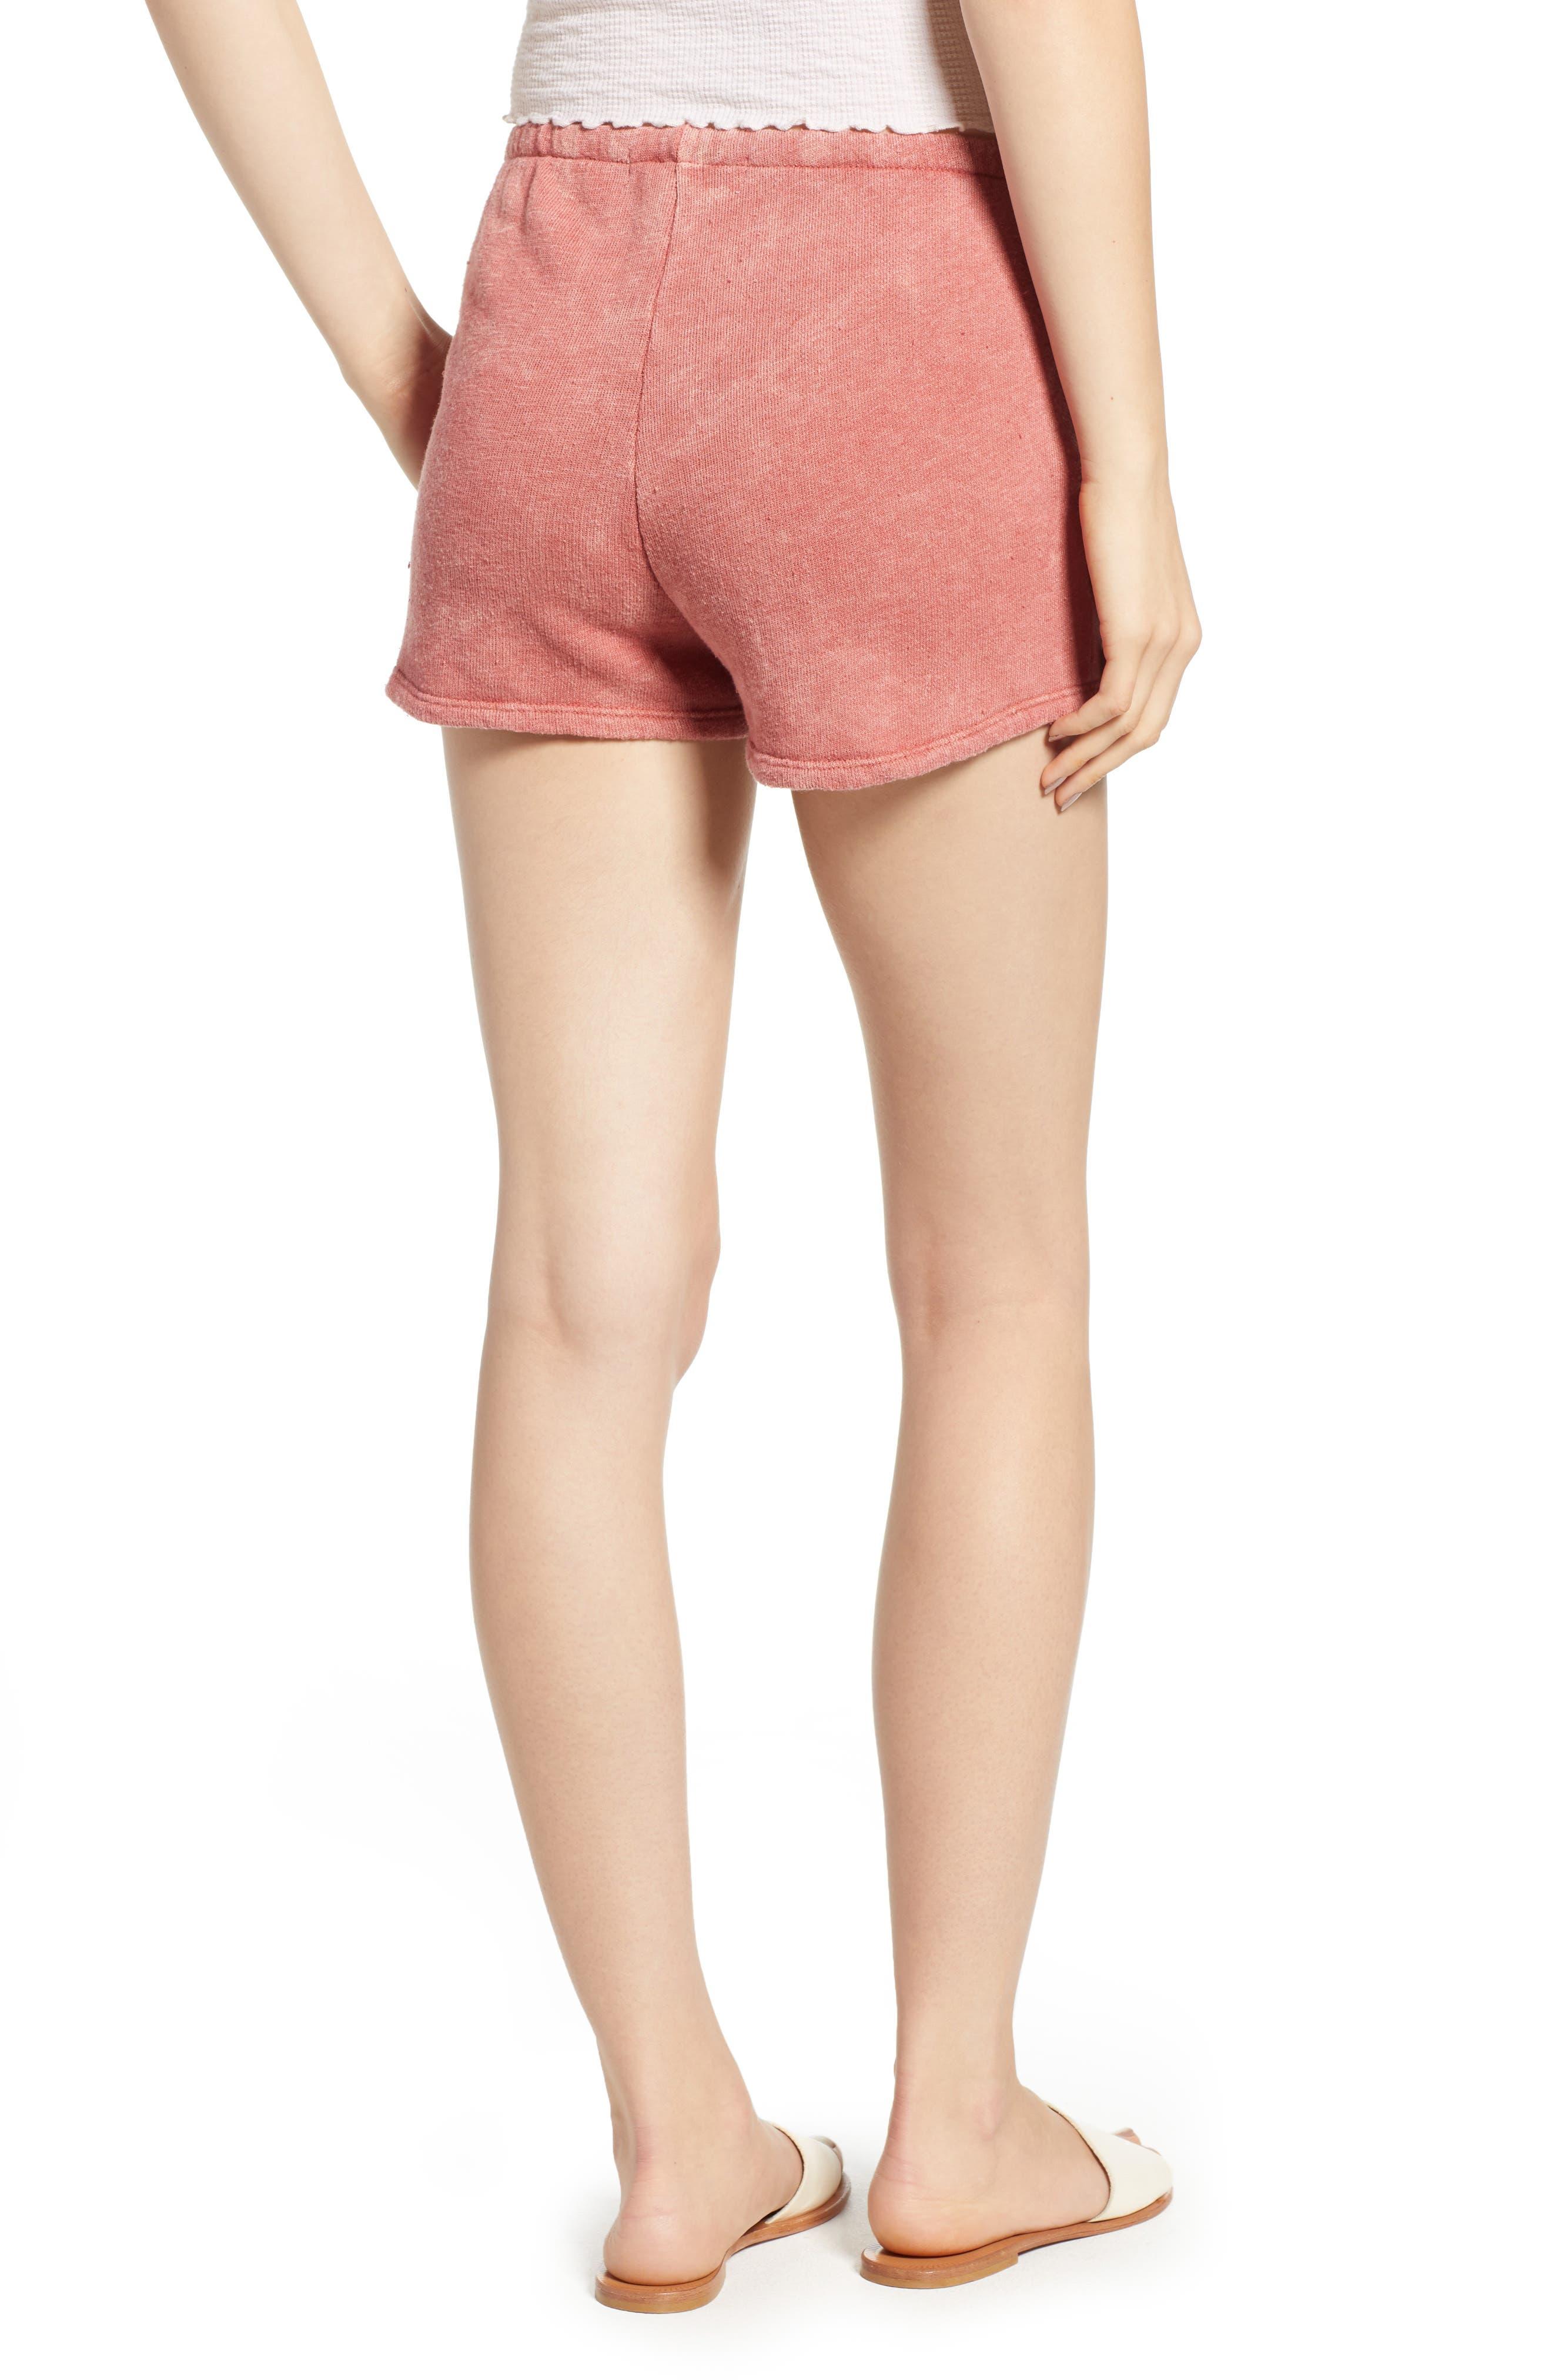 Kiama Shorts,                             Alternate thumbnail 2, color,                             Strawberry Rouge